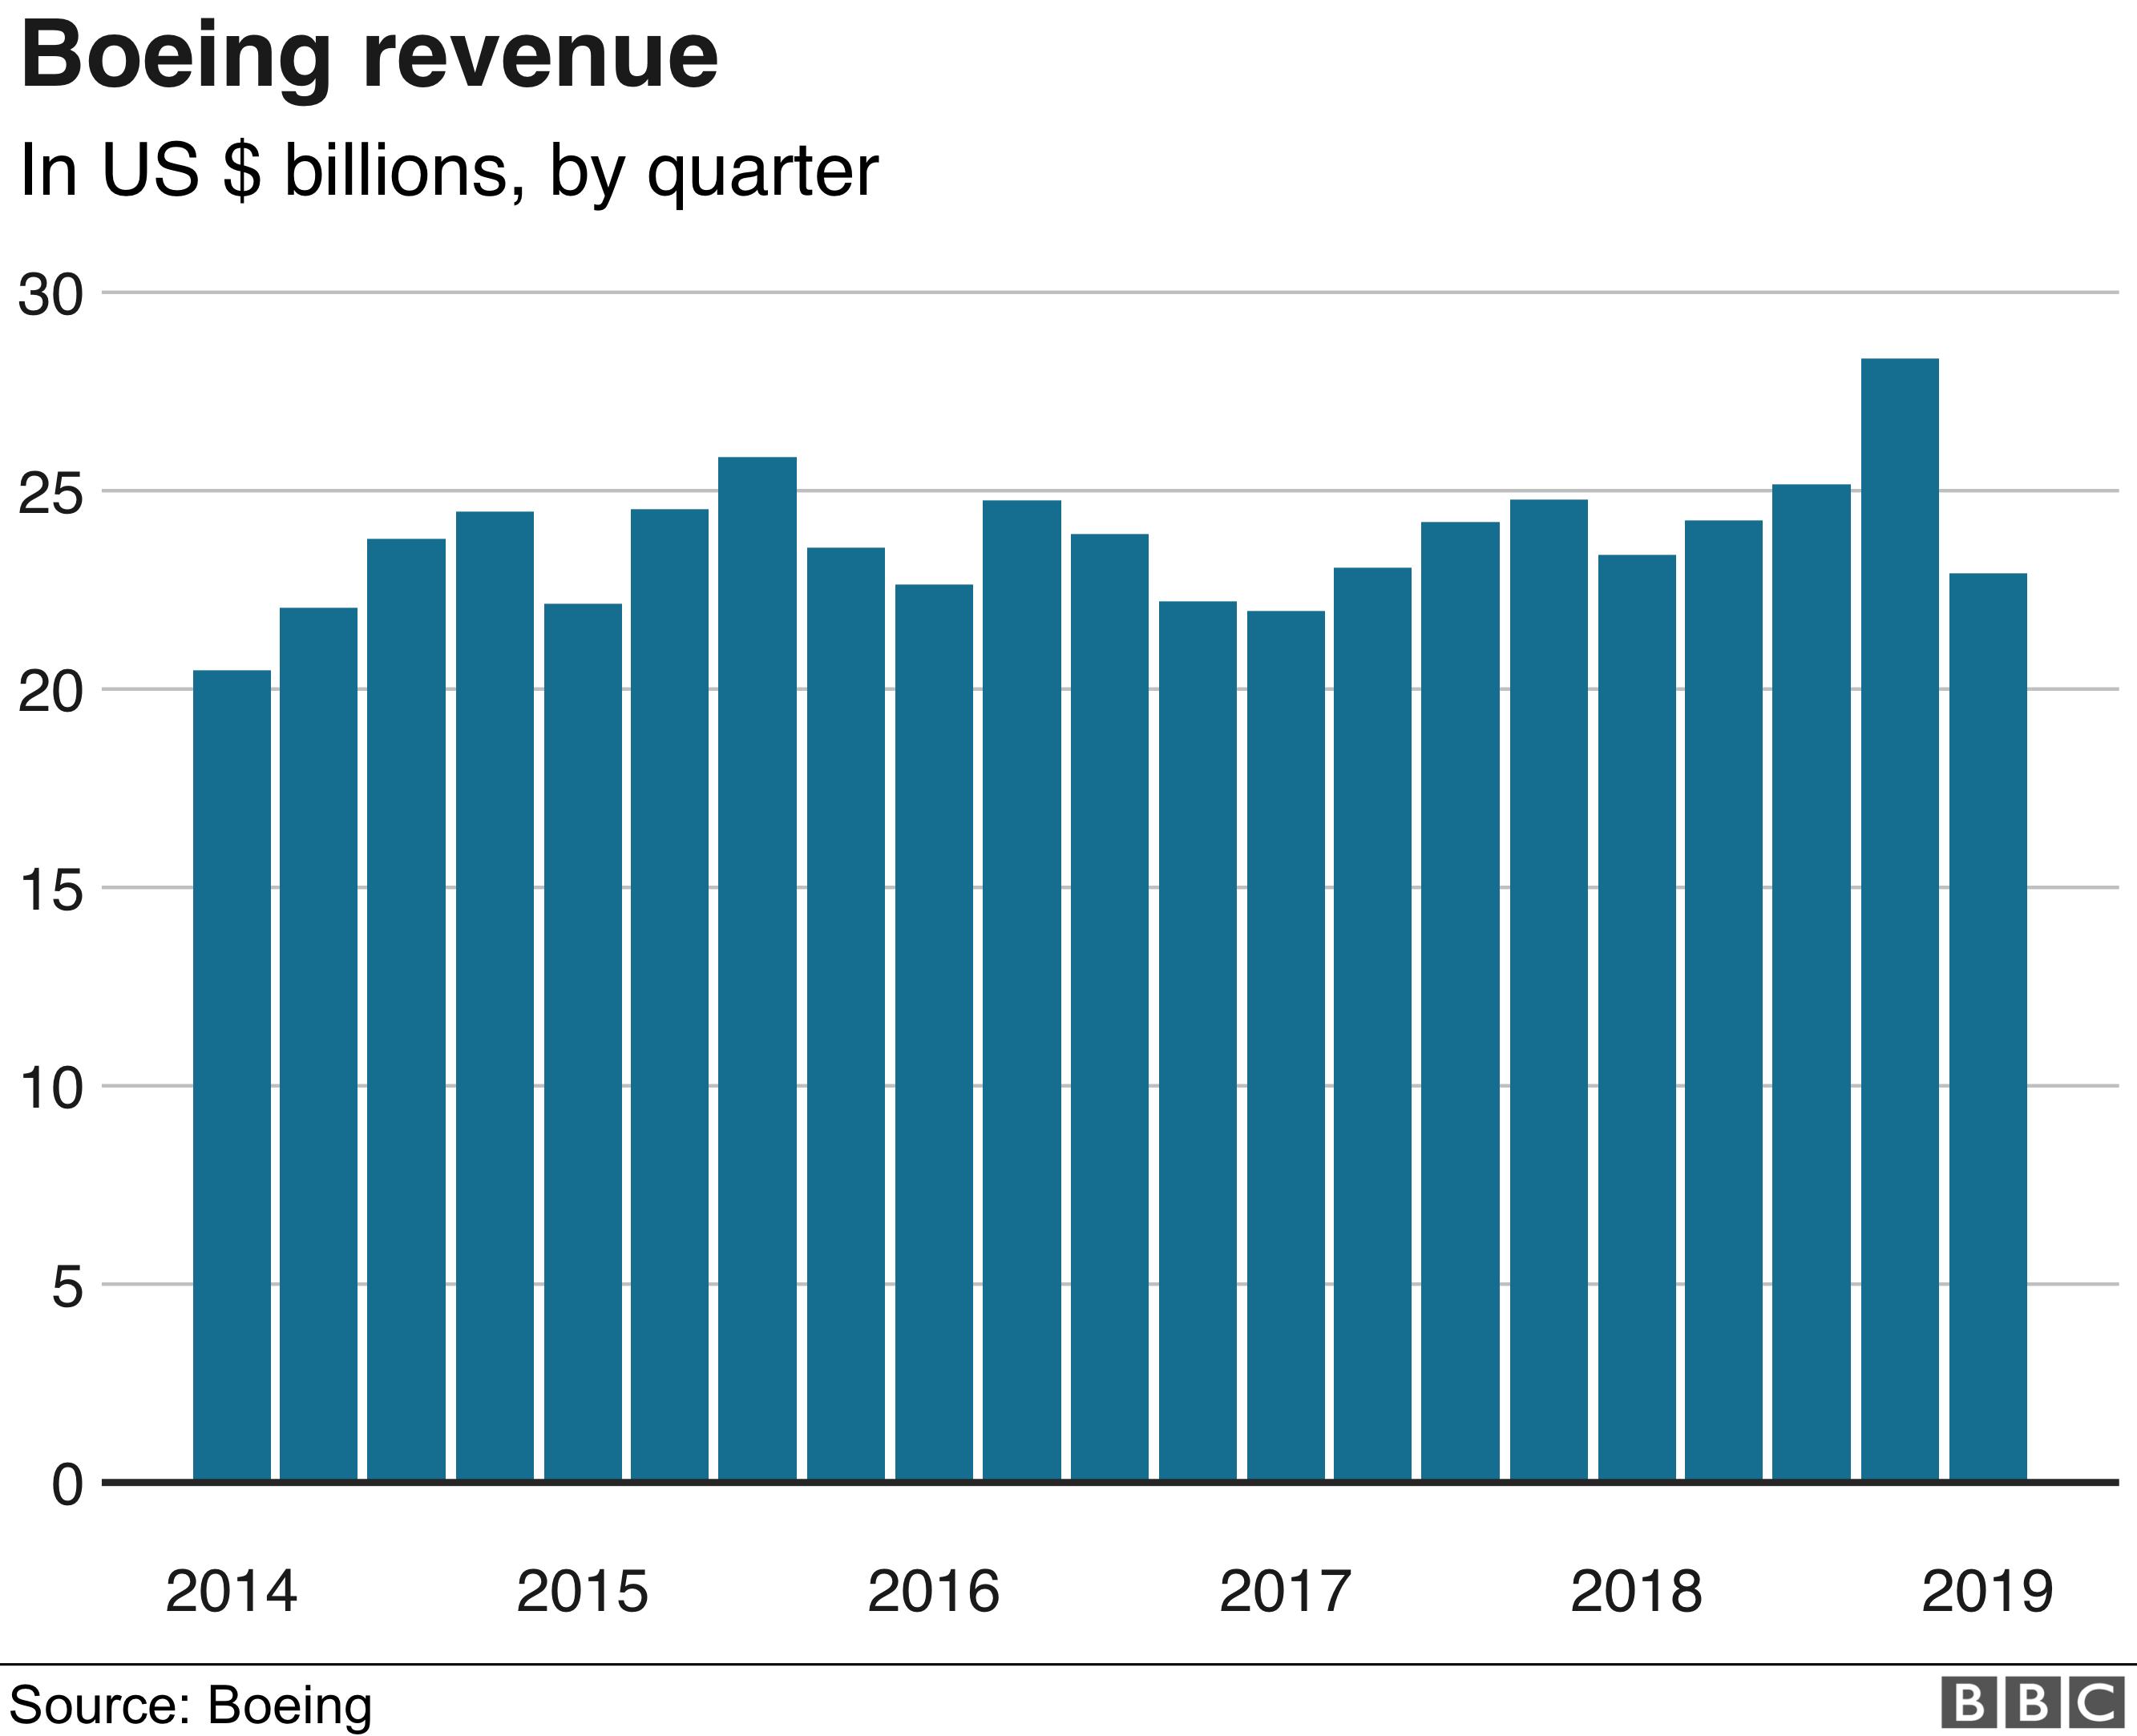 Boeing's revenues